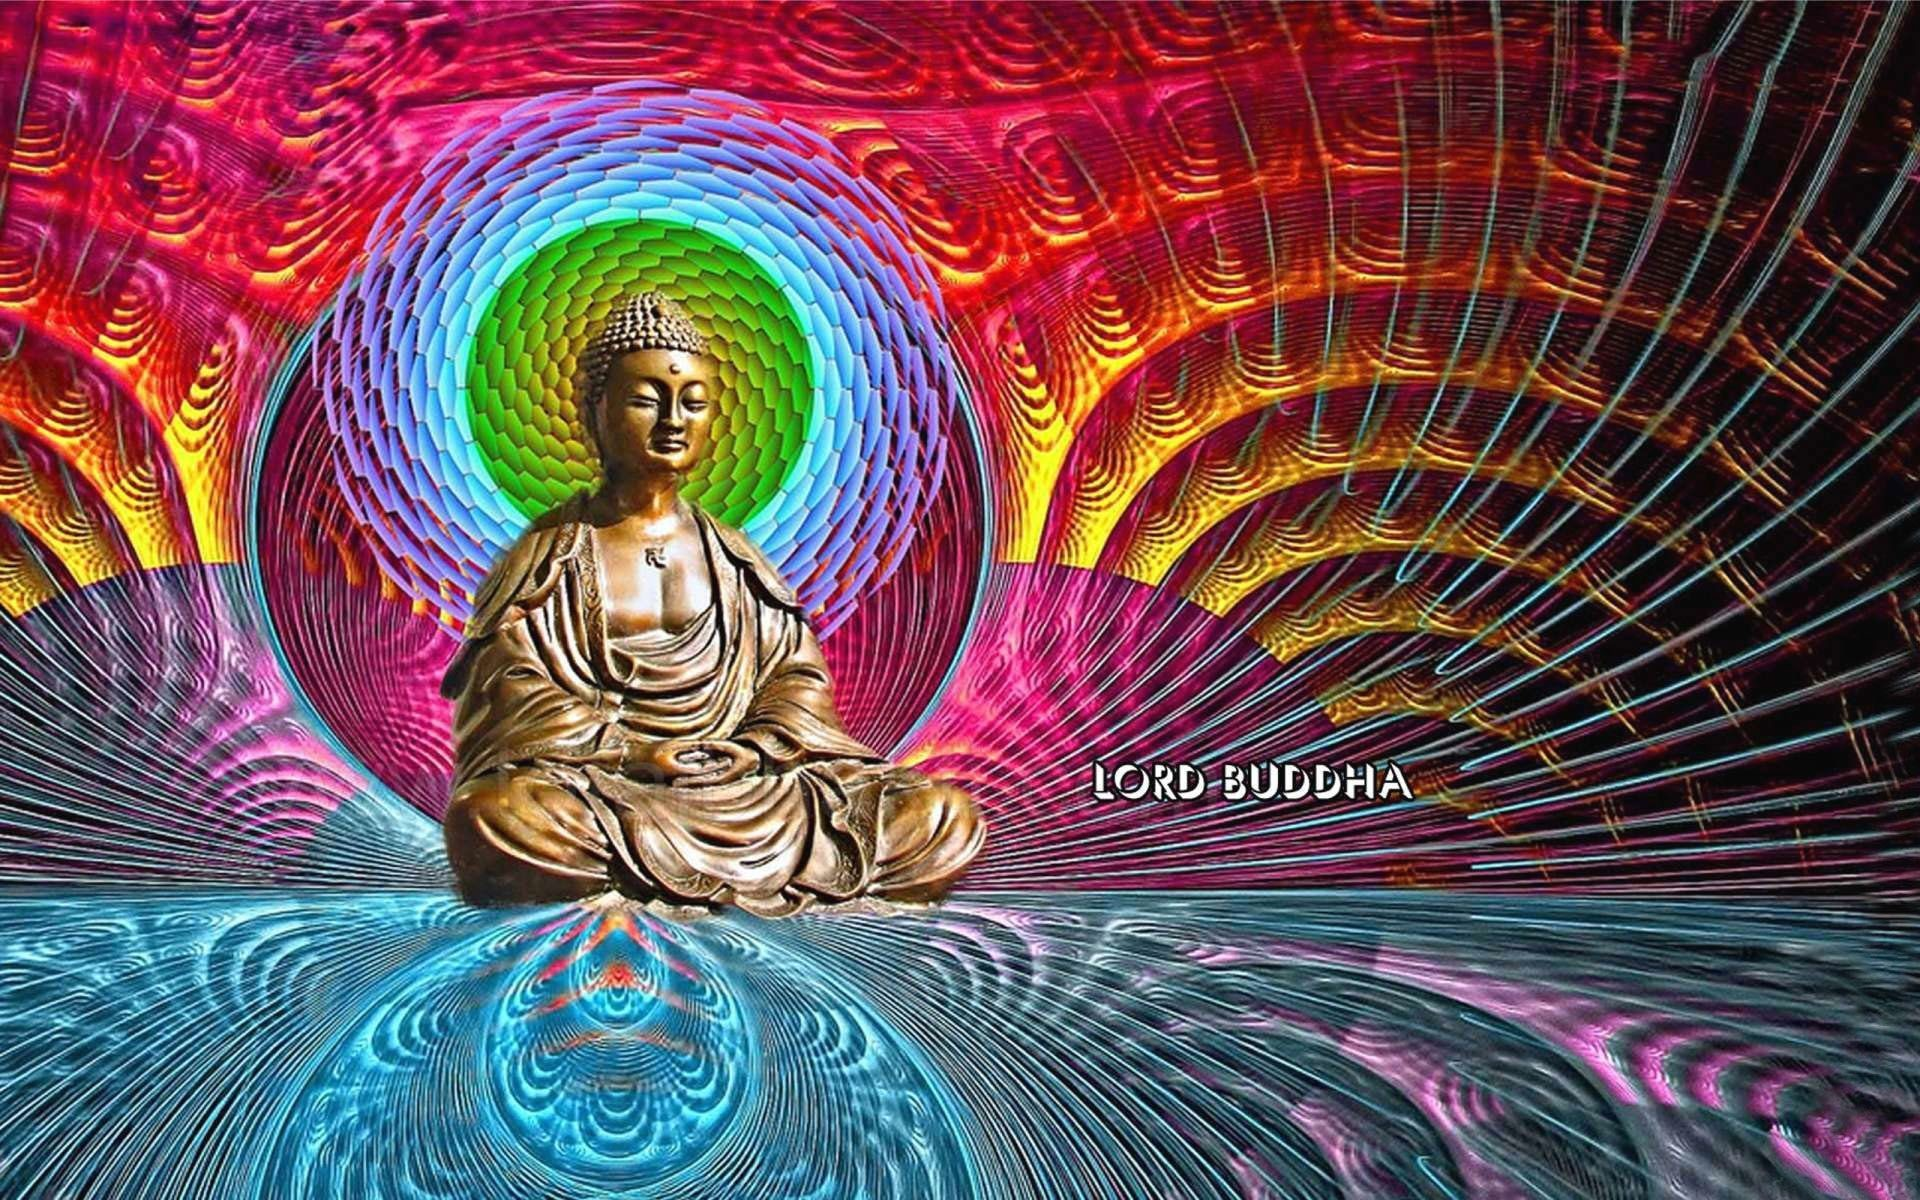 Gautam Buddha Wallpapers, photos & images free download